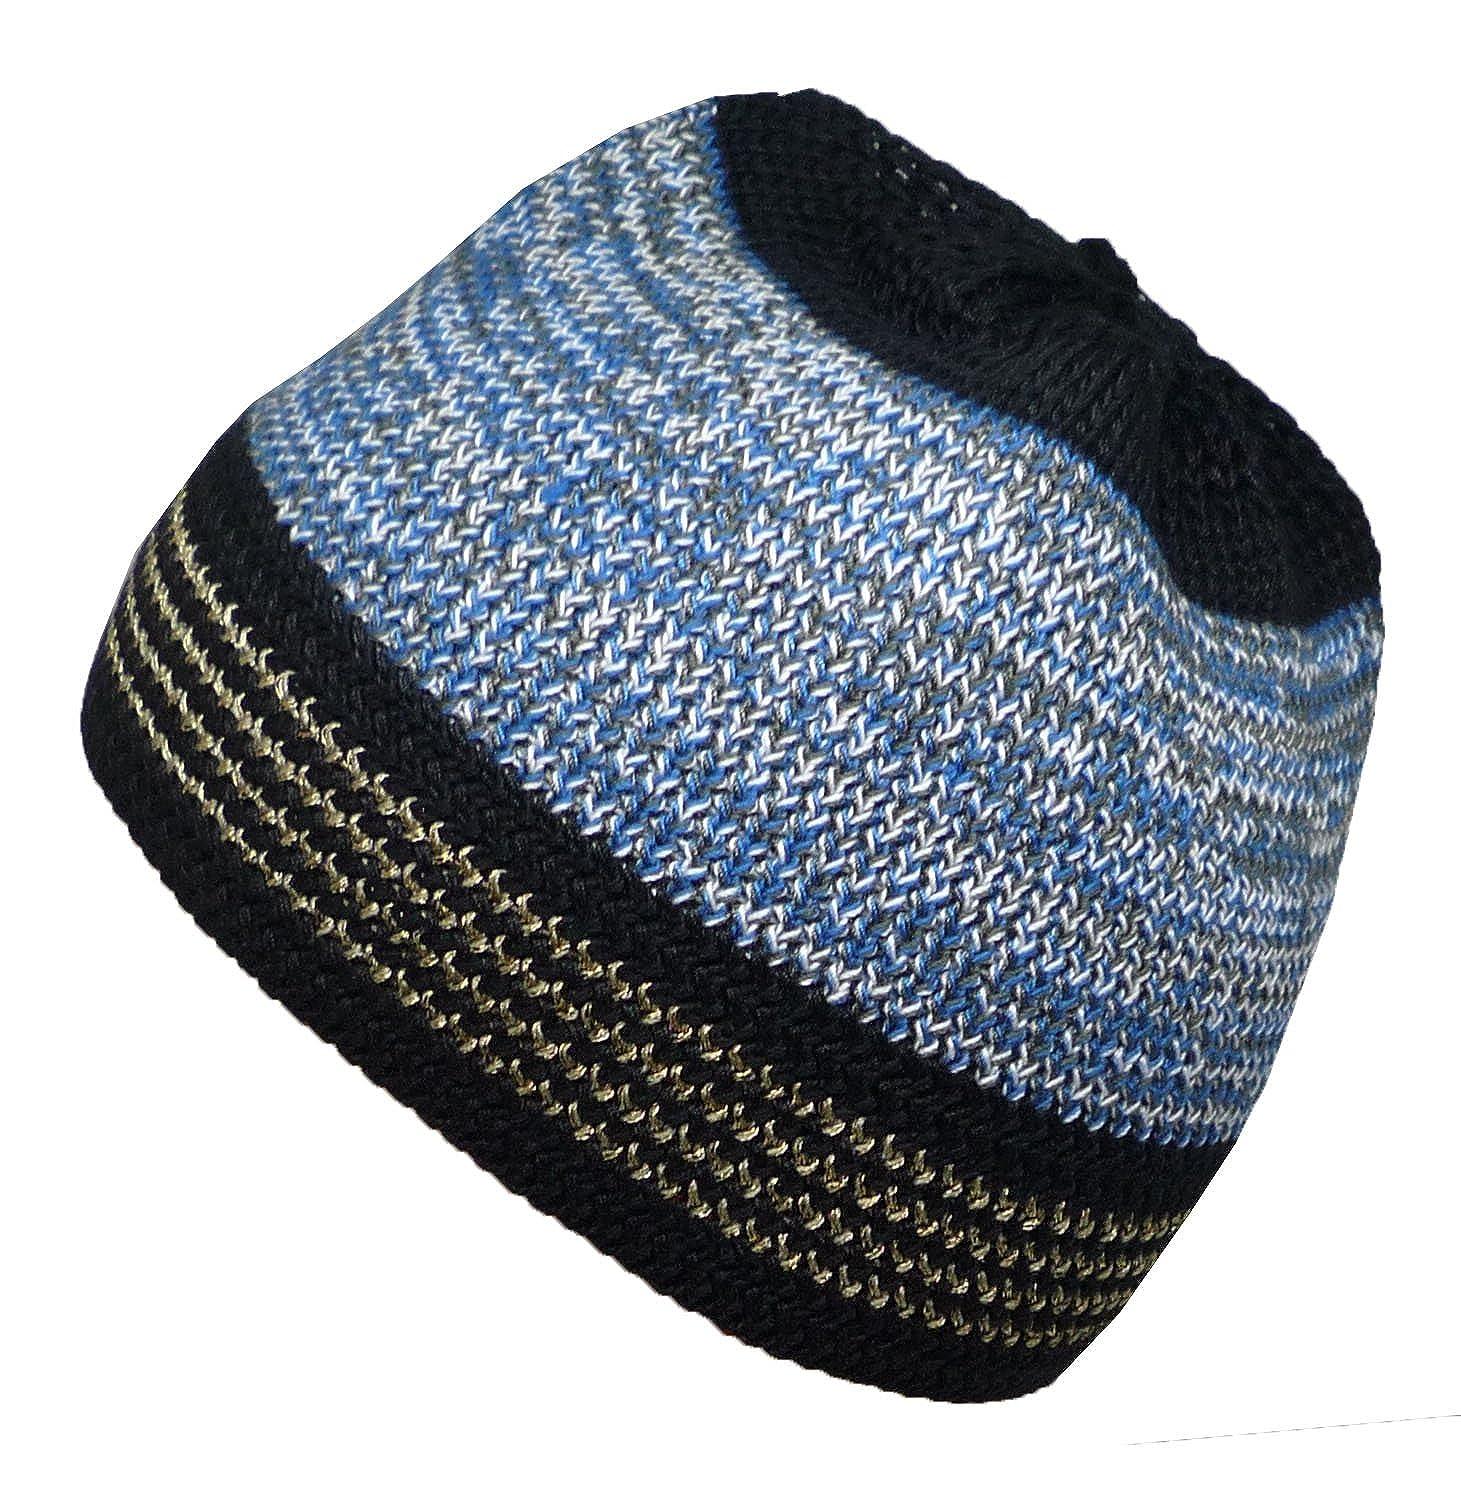 8642c69f9b2 Al-Ameen Islamic Skull Cap Amn035 Muslim Kufi Hat Stretchy Elastic Beanie  Taqiyah Takke (Color01) at Amazon Men s Clothing store